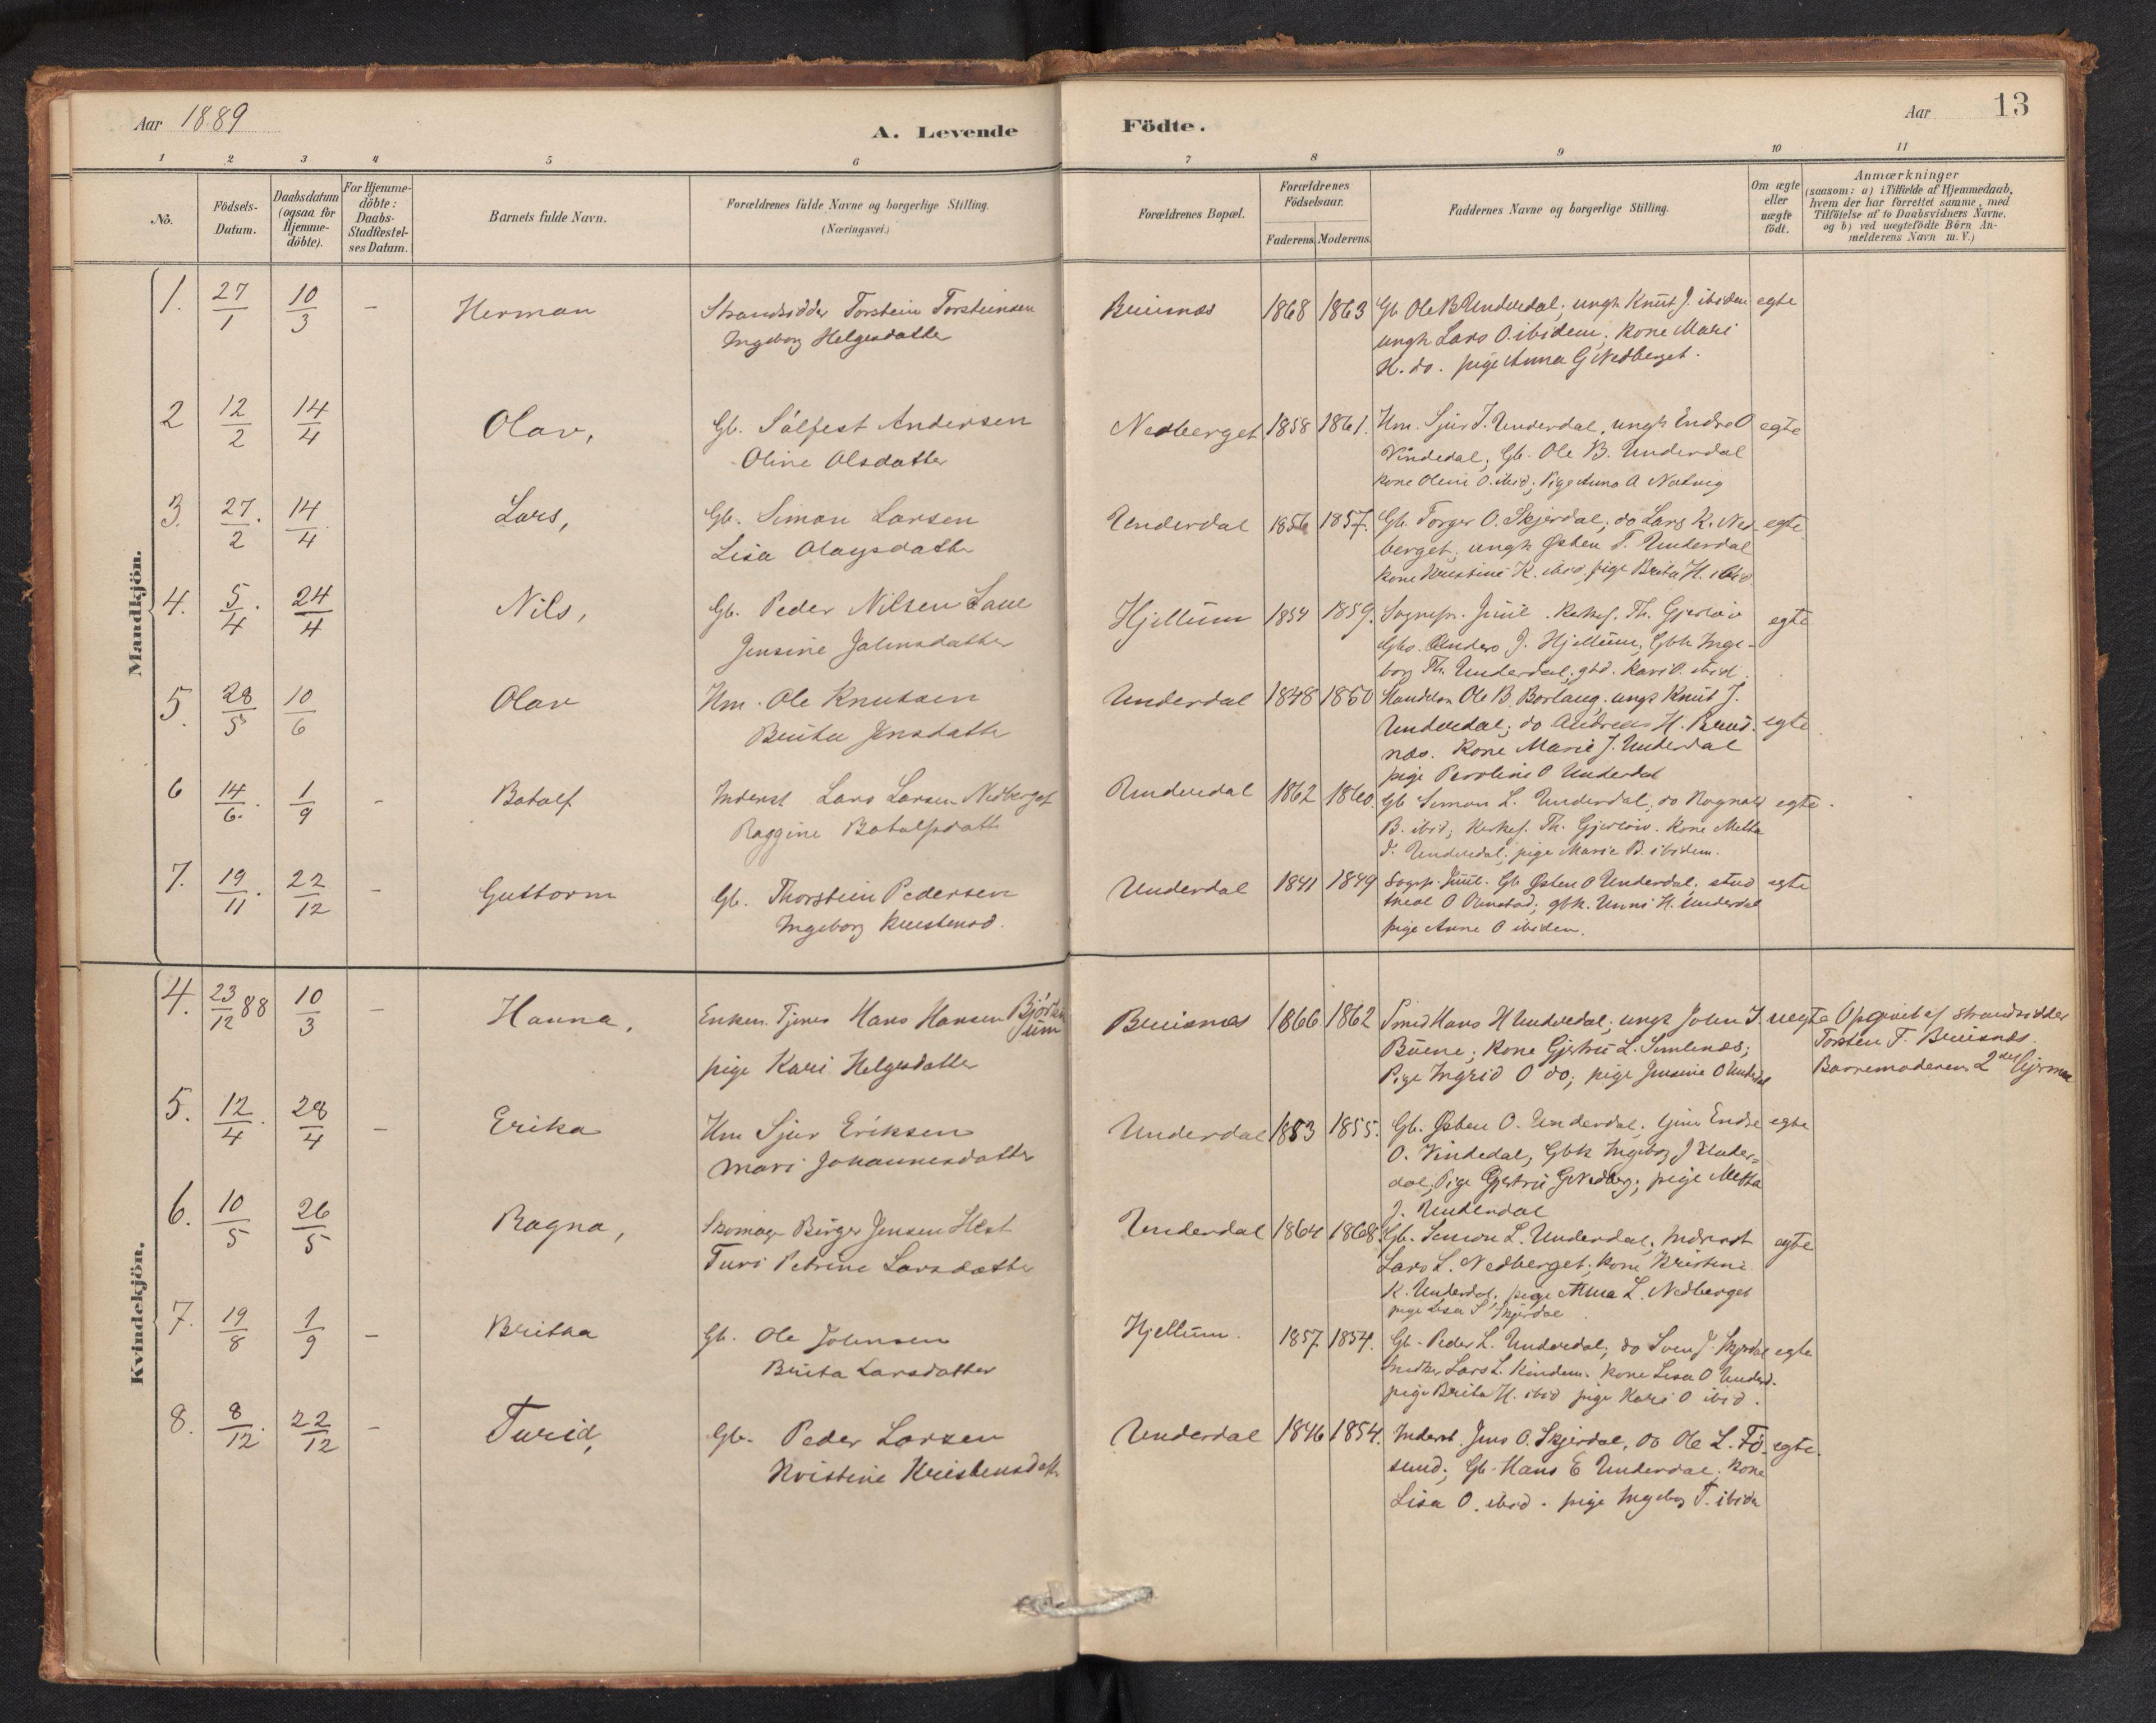 SAB, Aurland sokneprestembete, H/Ha/Hae/L0001: Ministerialbok nr. E 1, 1880-1907, s. 12b-13a